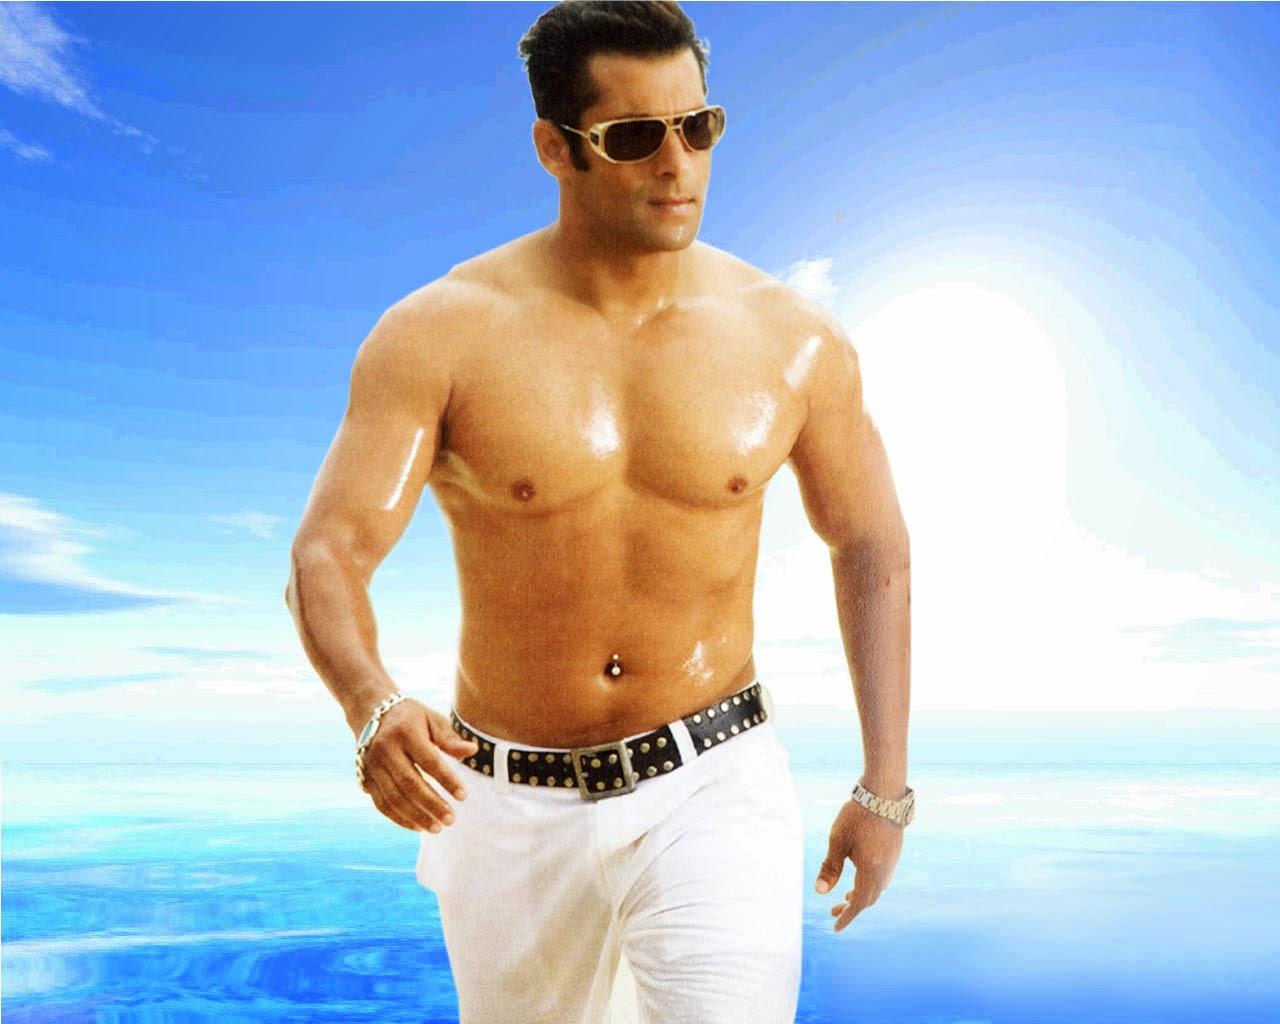 Hd new free wallpapers Salman Khan New Wallpaper